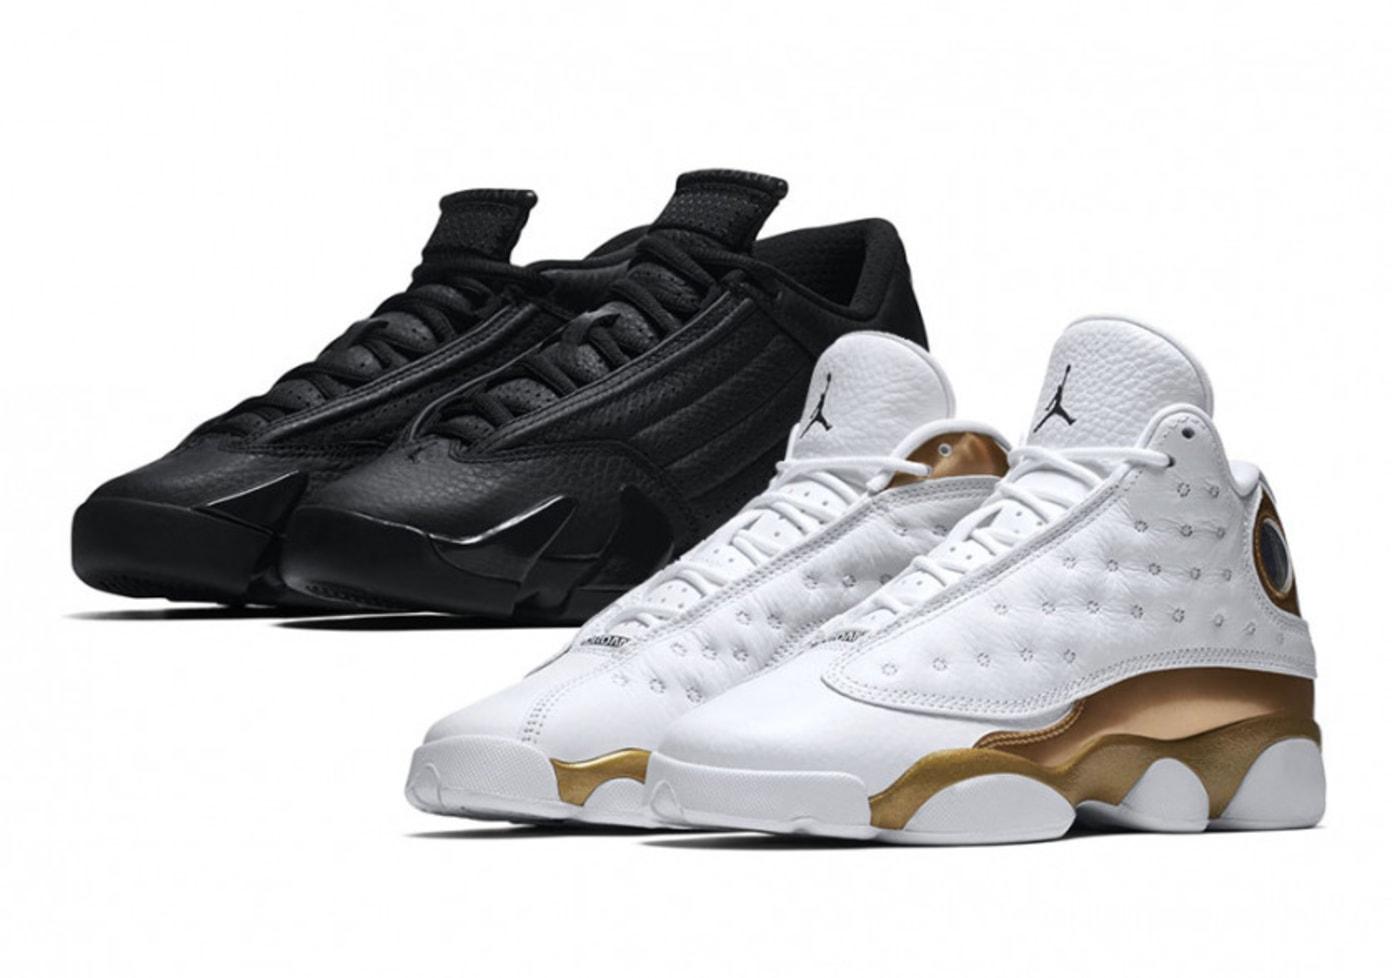 EXCLUSIVE: Nike Air Jordan 13/14 Defining Moments Pack